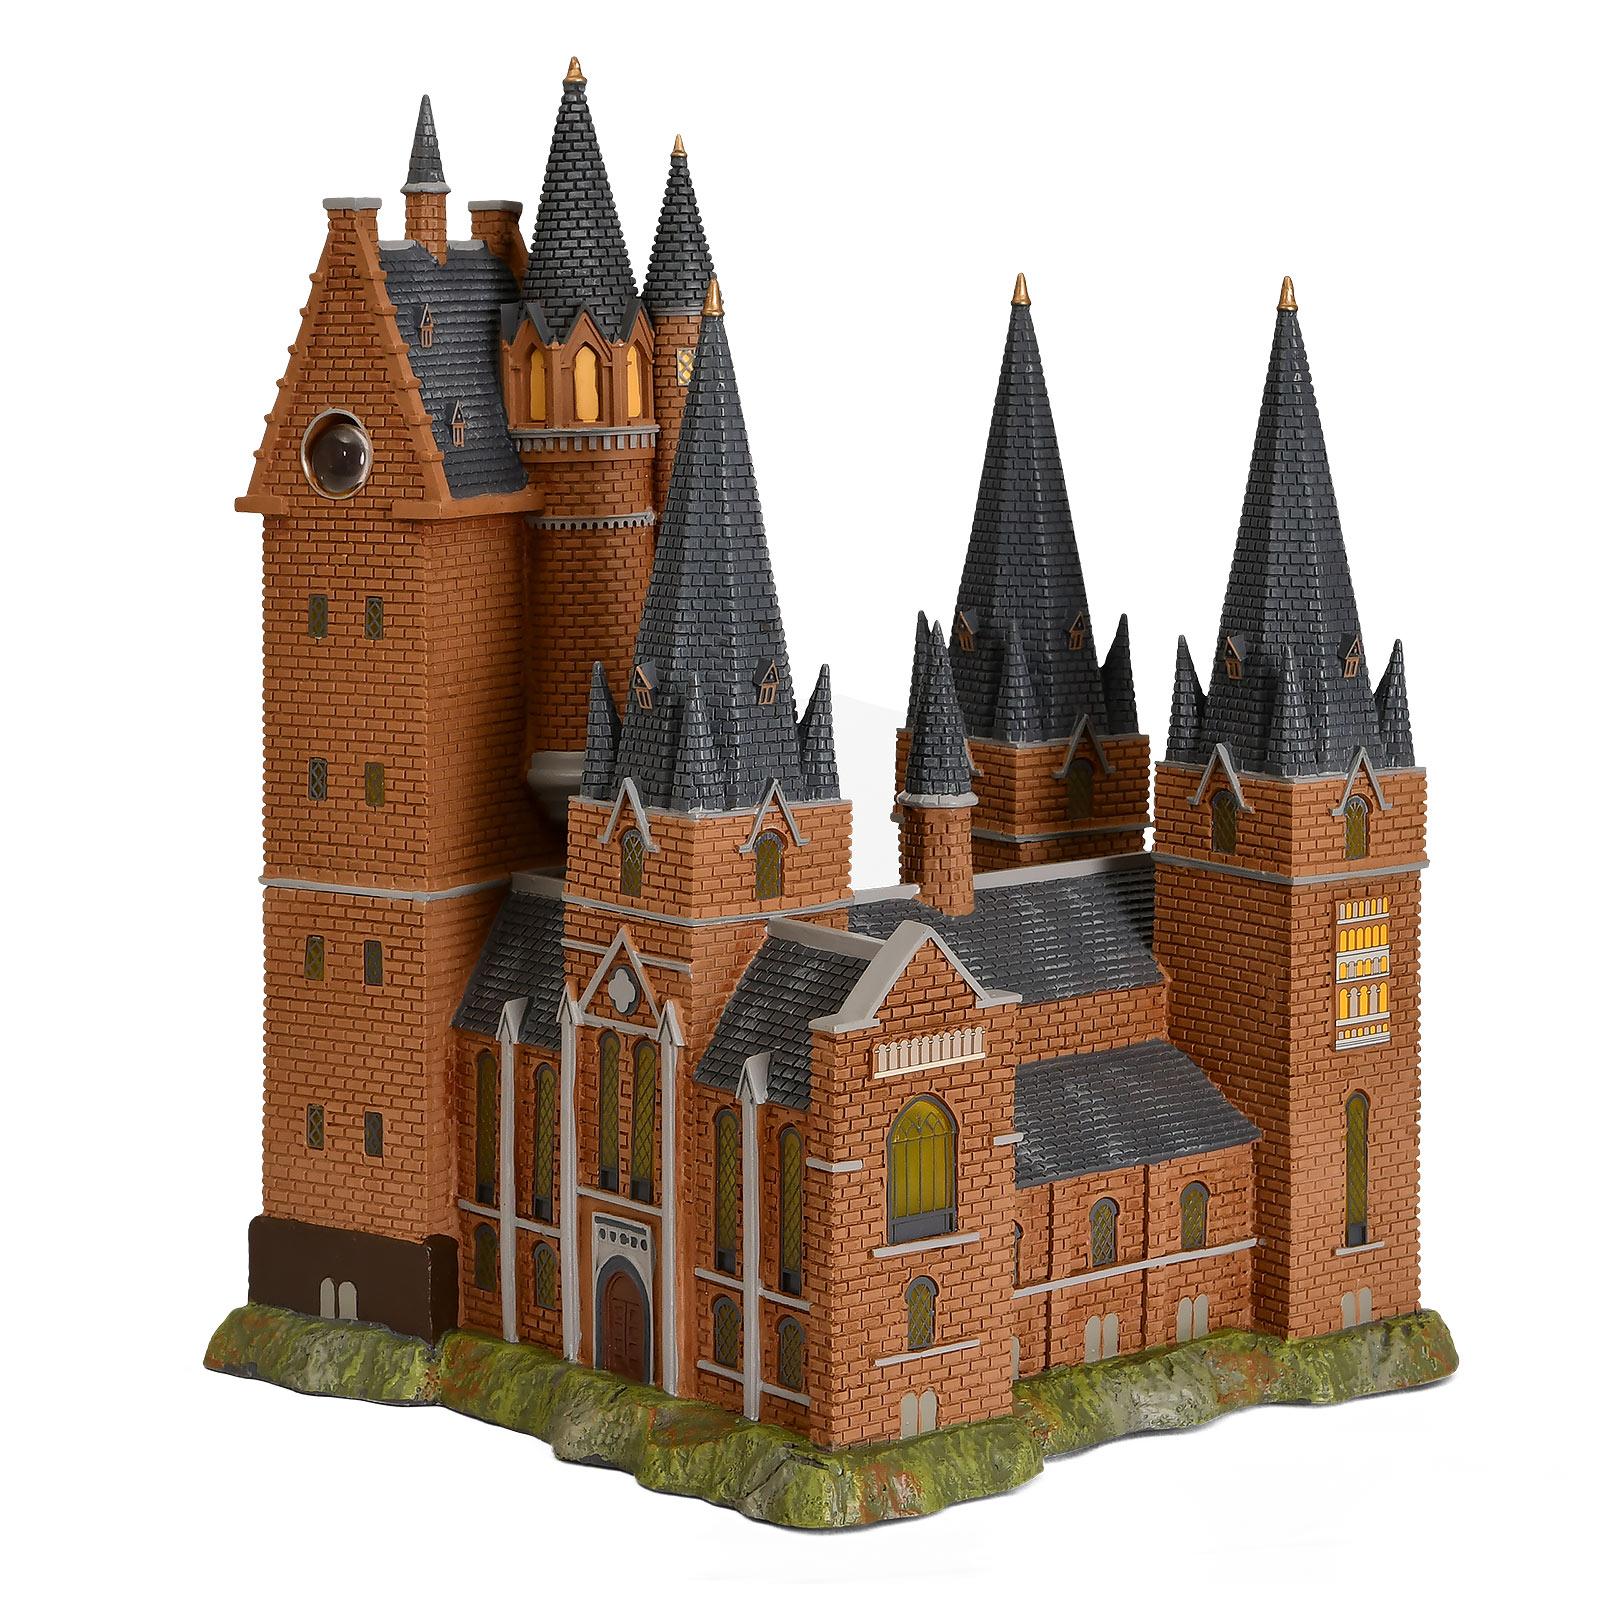 Hogwarts Astronomie-Turm Miniatur Replik mit Beleuchtung - Harry Potter